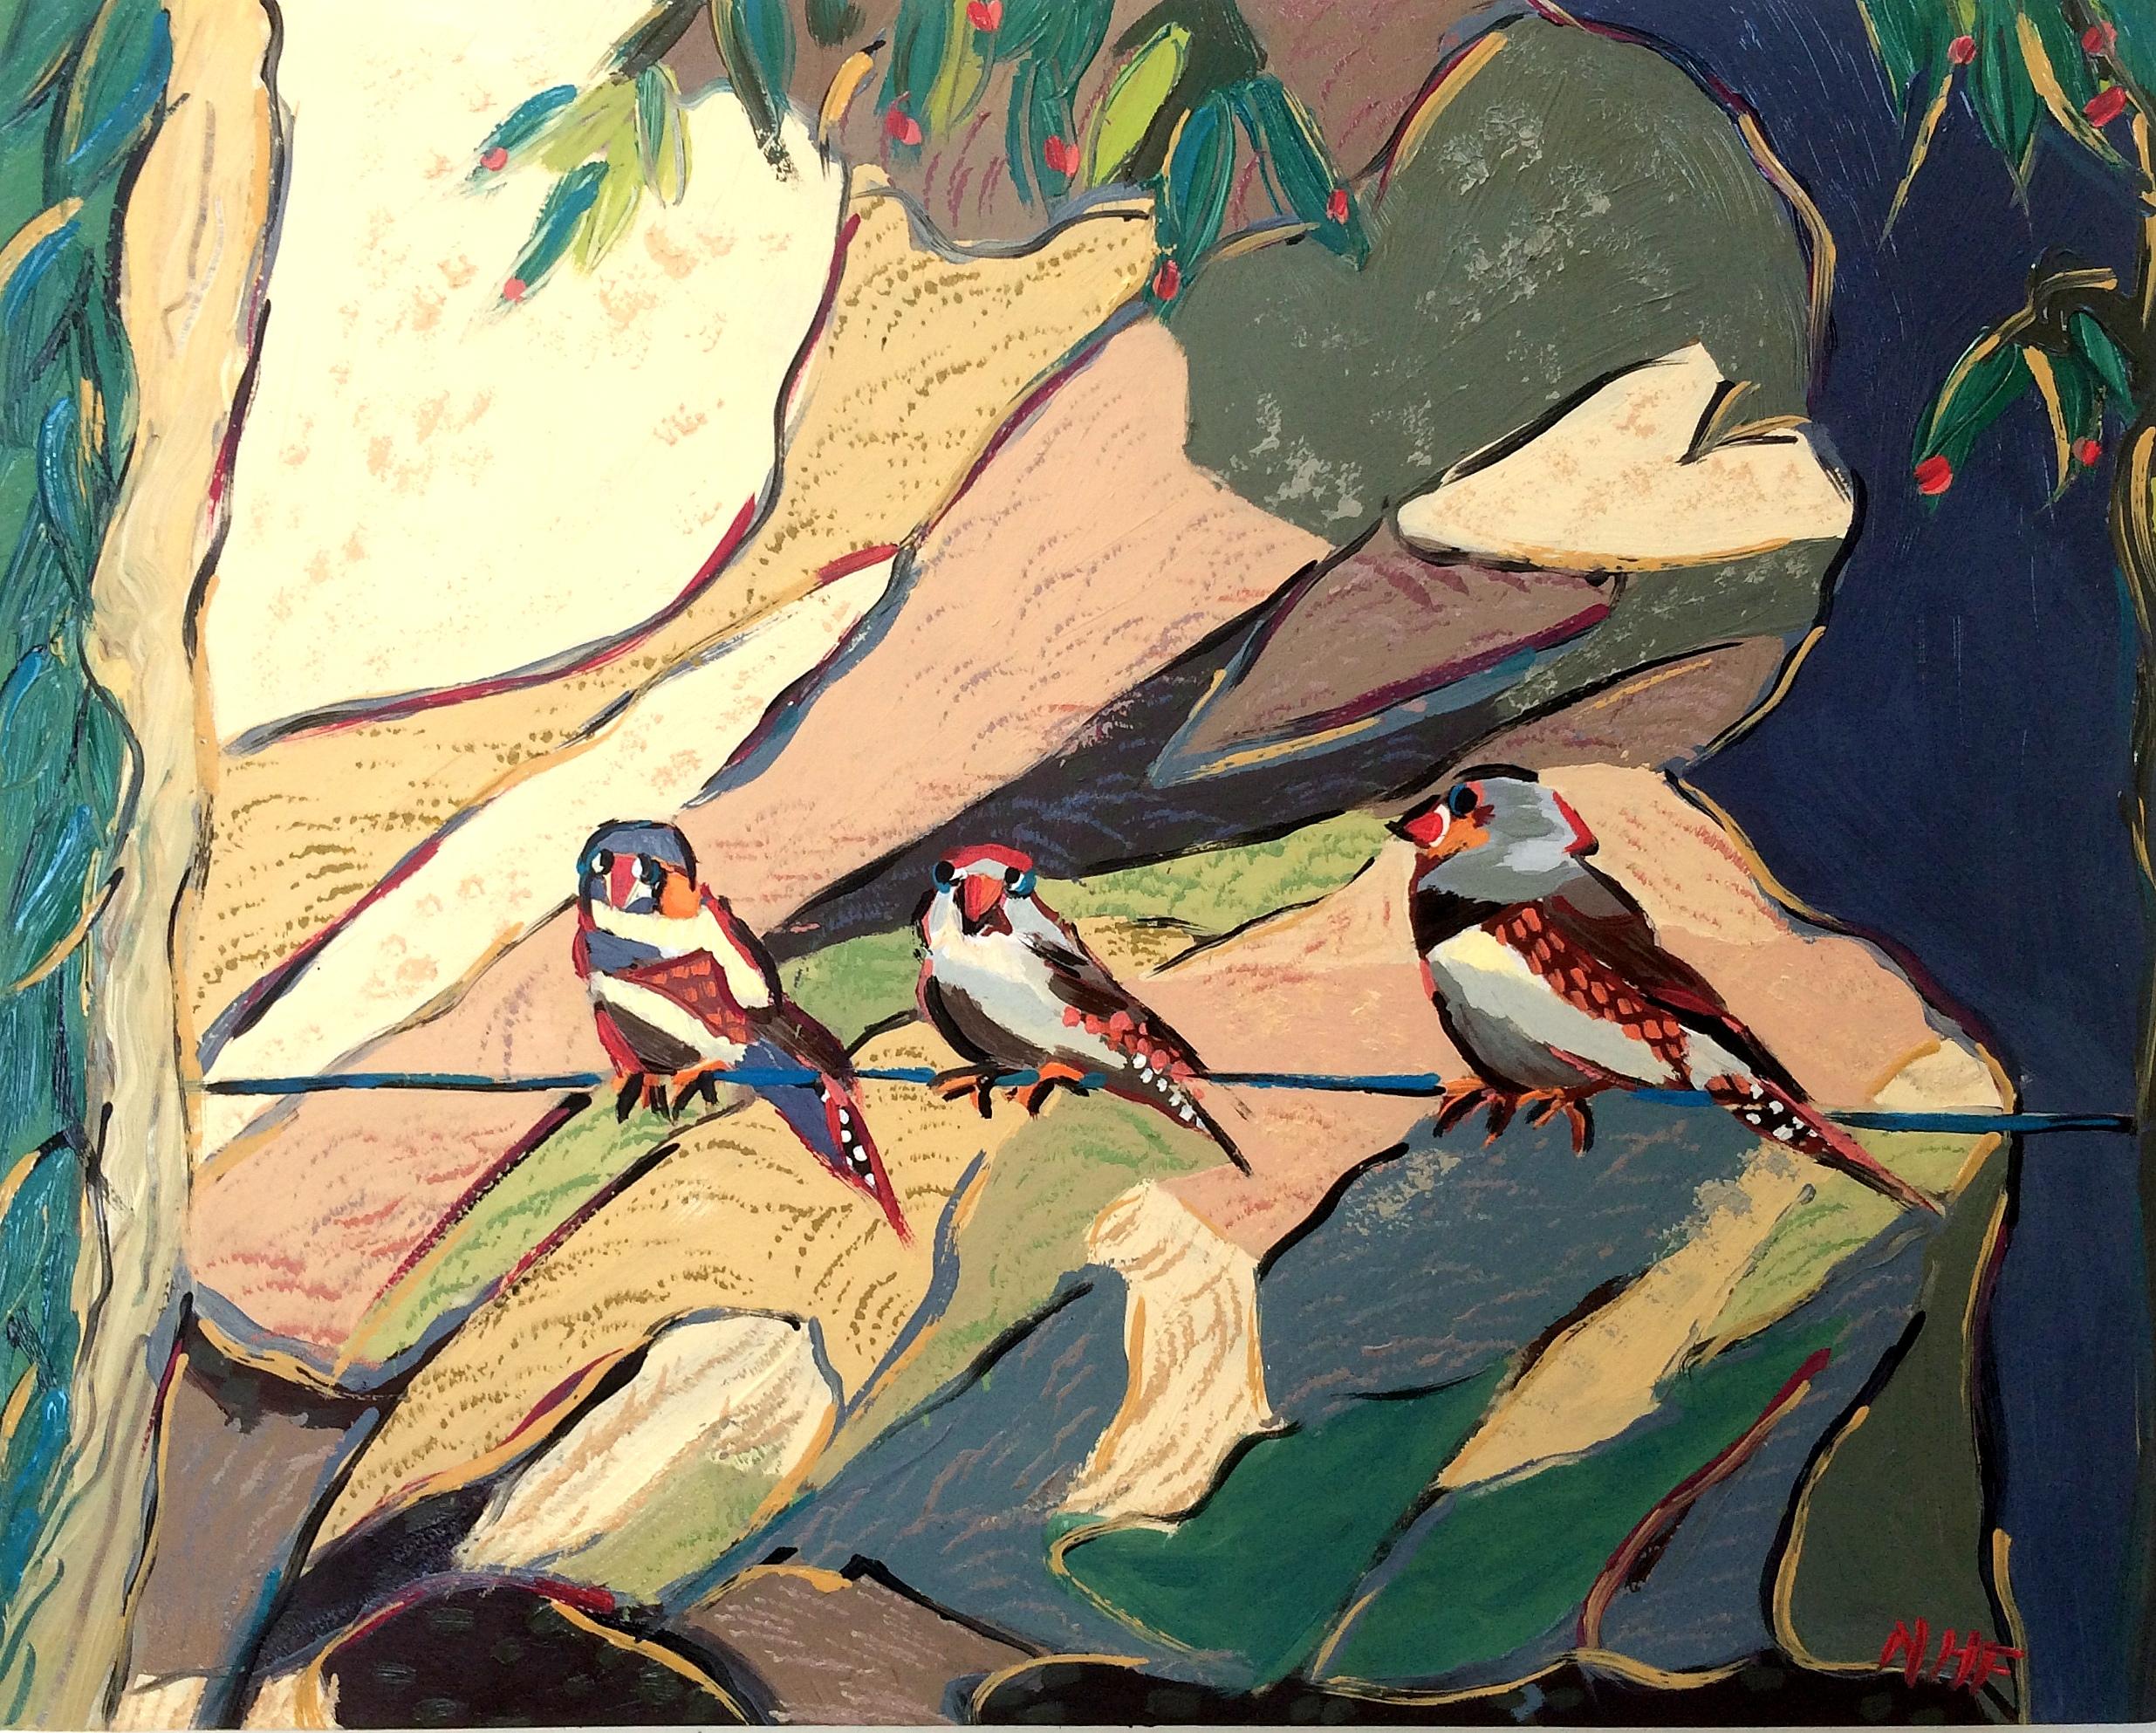 Birds Down Under 3 , oil on panel, 8x10, SOLD